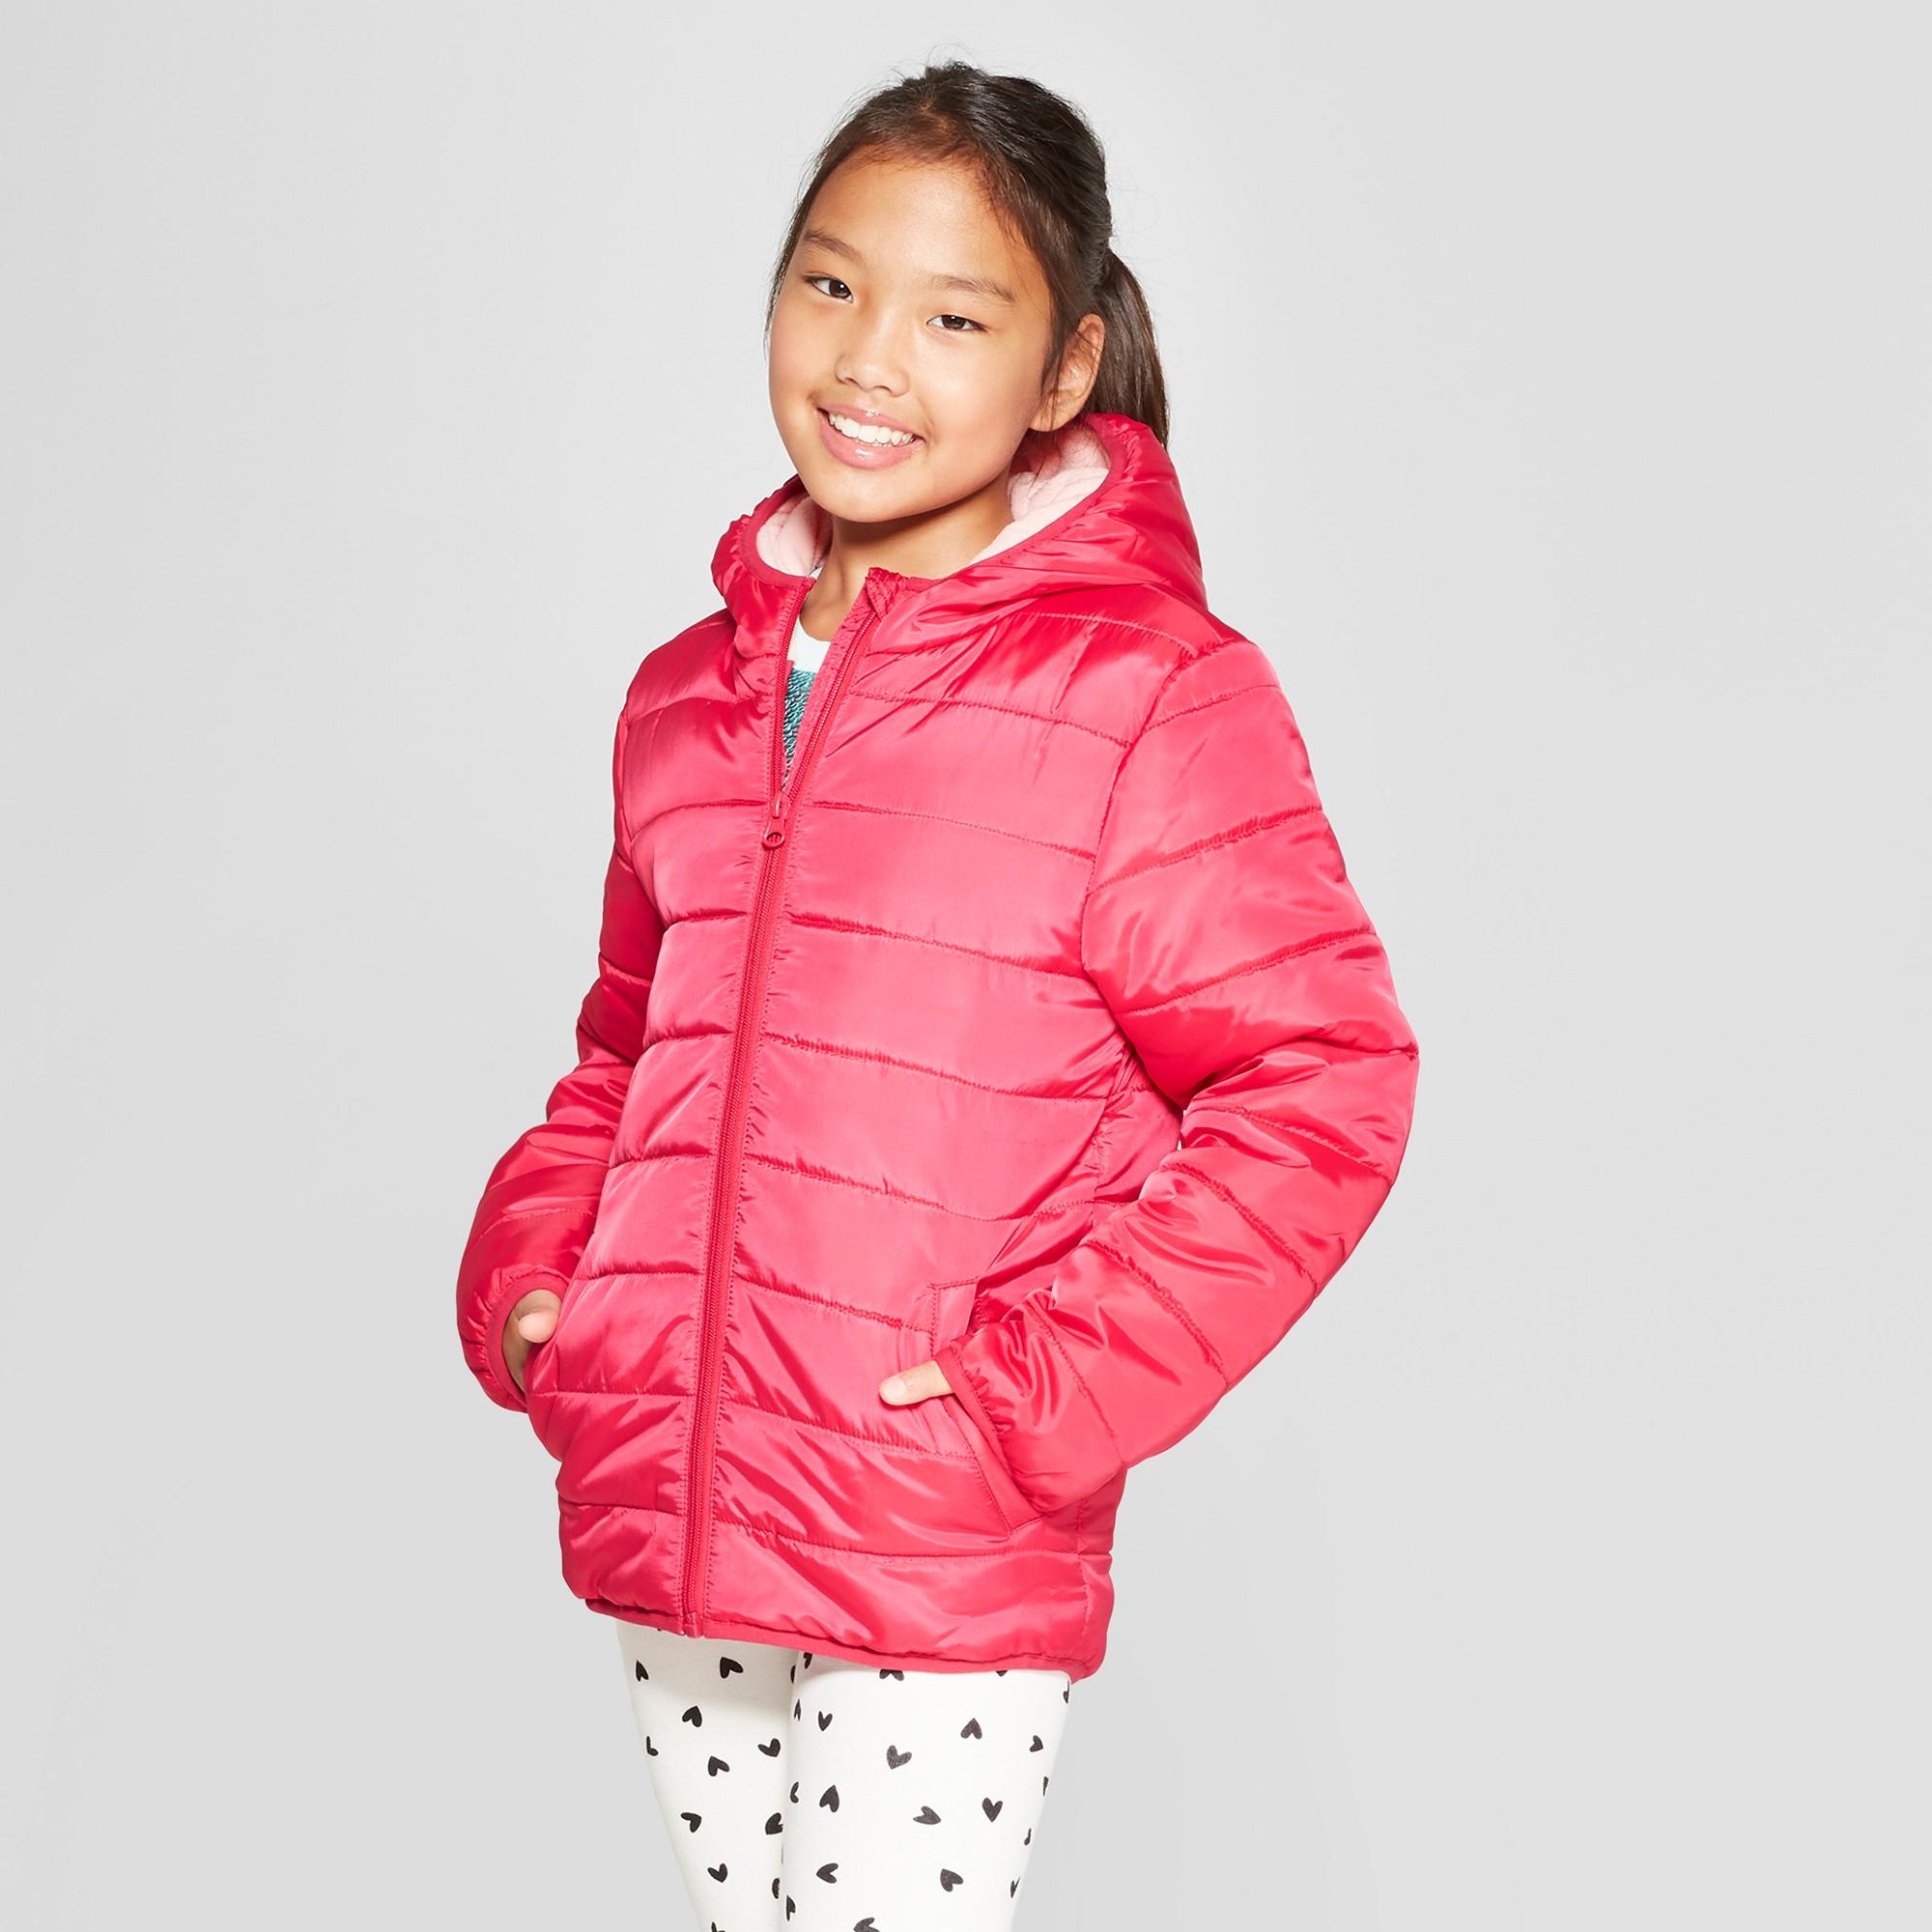 Girls' Puffer Jacket Cat & Jack Red XS, Girl's | Girls